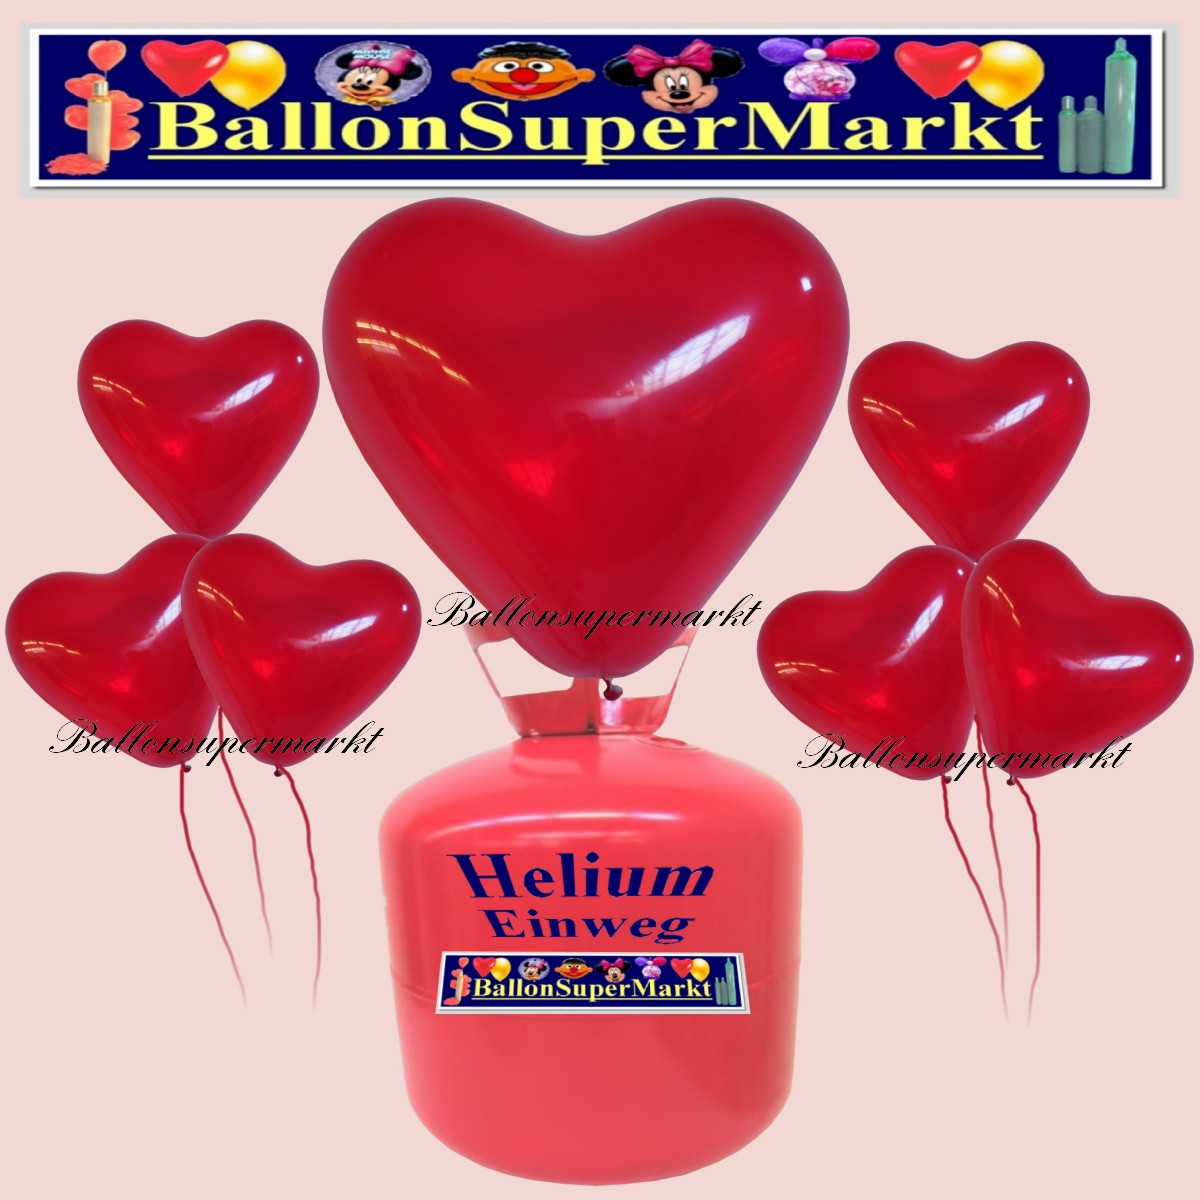 luftballons helium einweg set herzluftballons kristall rot 50 st ck lu hs luftballons helium. Black Bedroom Furniture Sets. Home Design Ideas